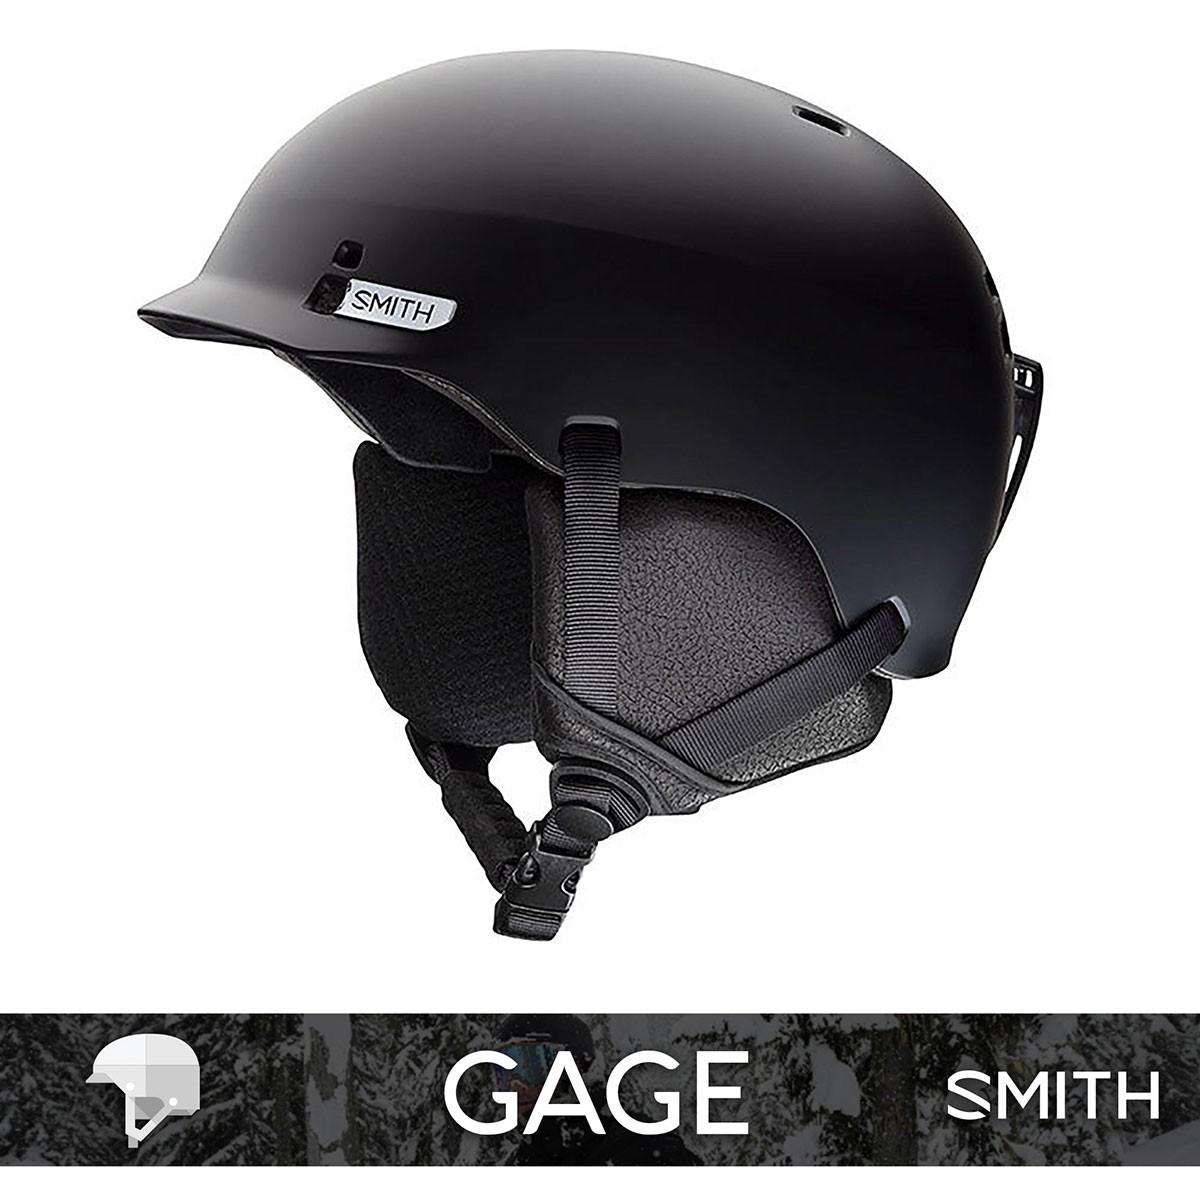 SMITH GAGE matte Black - Изображение - AQUAMATRIX